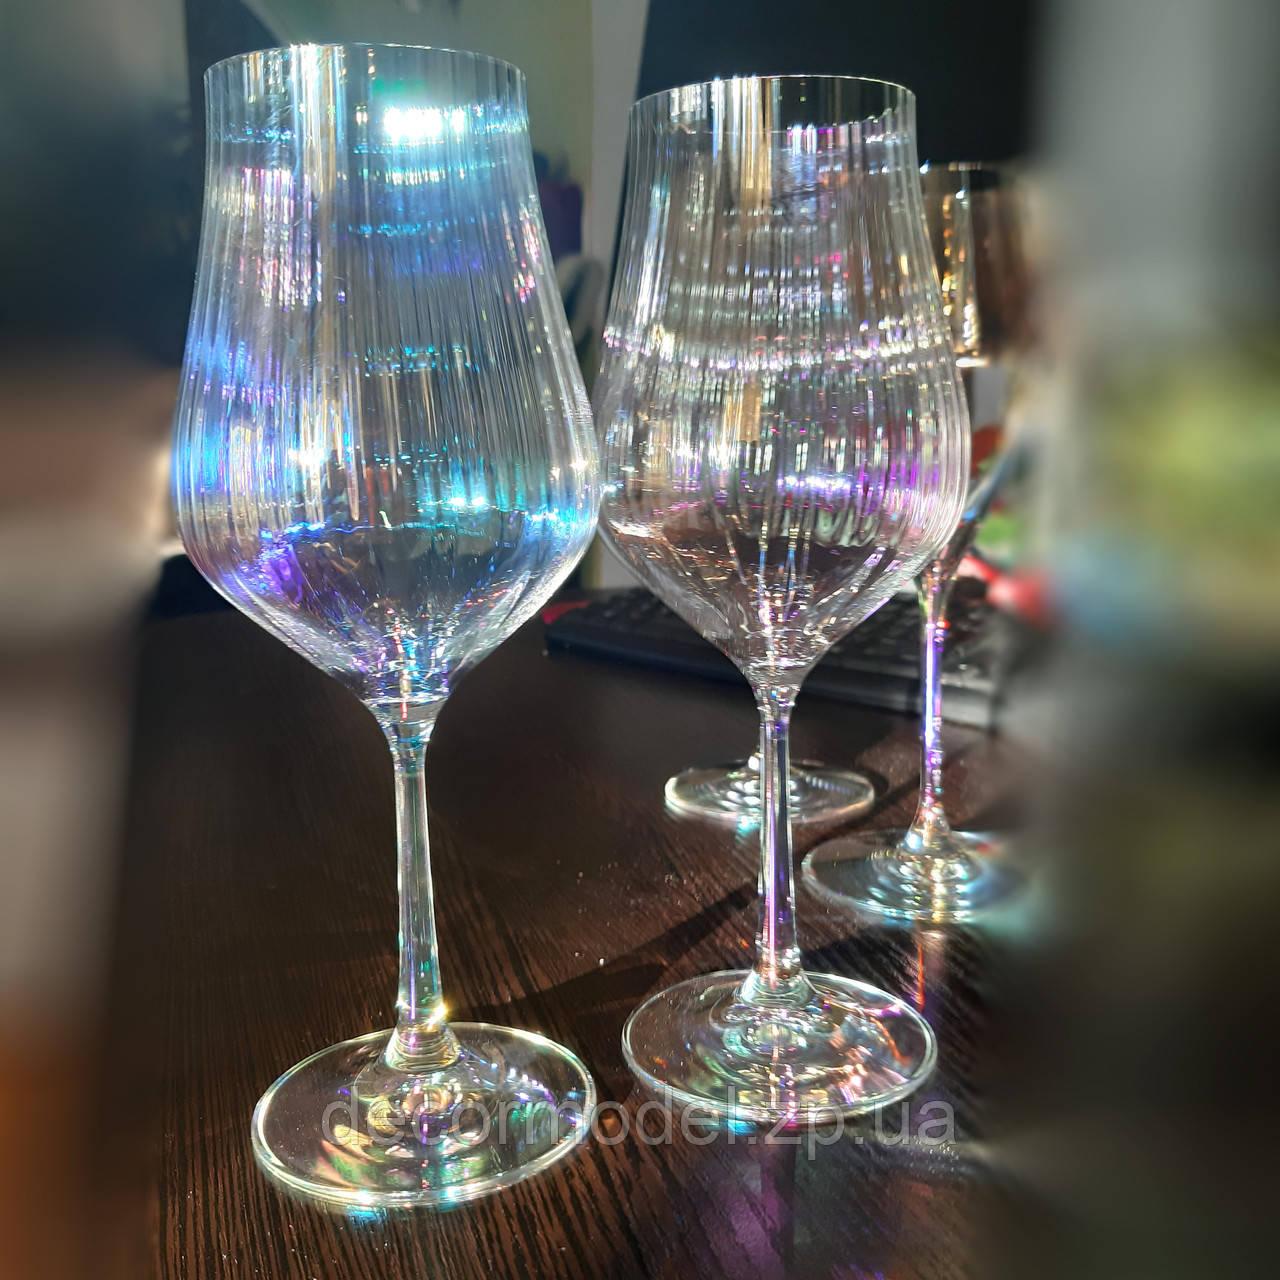 Бокал для вина Bohemia Tulipa optic 350 мл перламутровый 1 шт